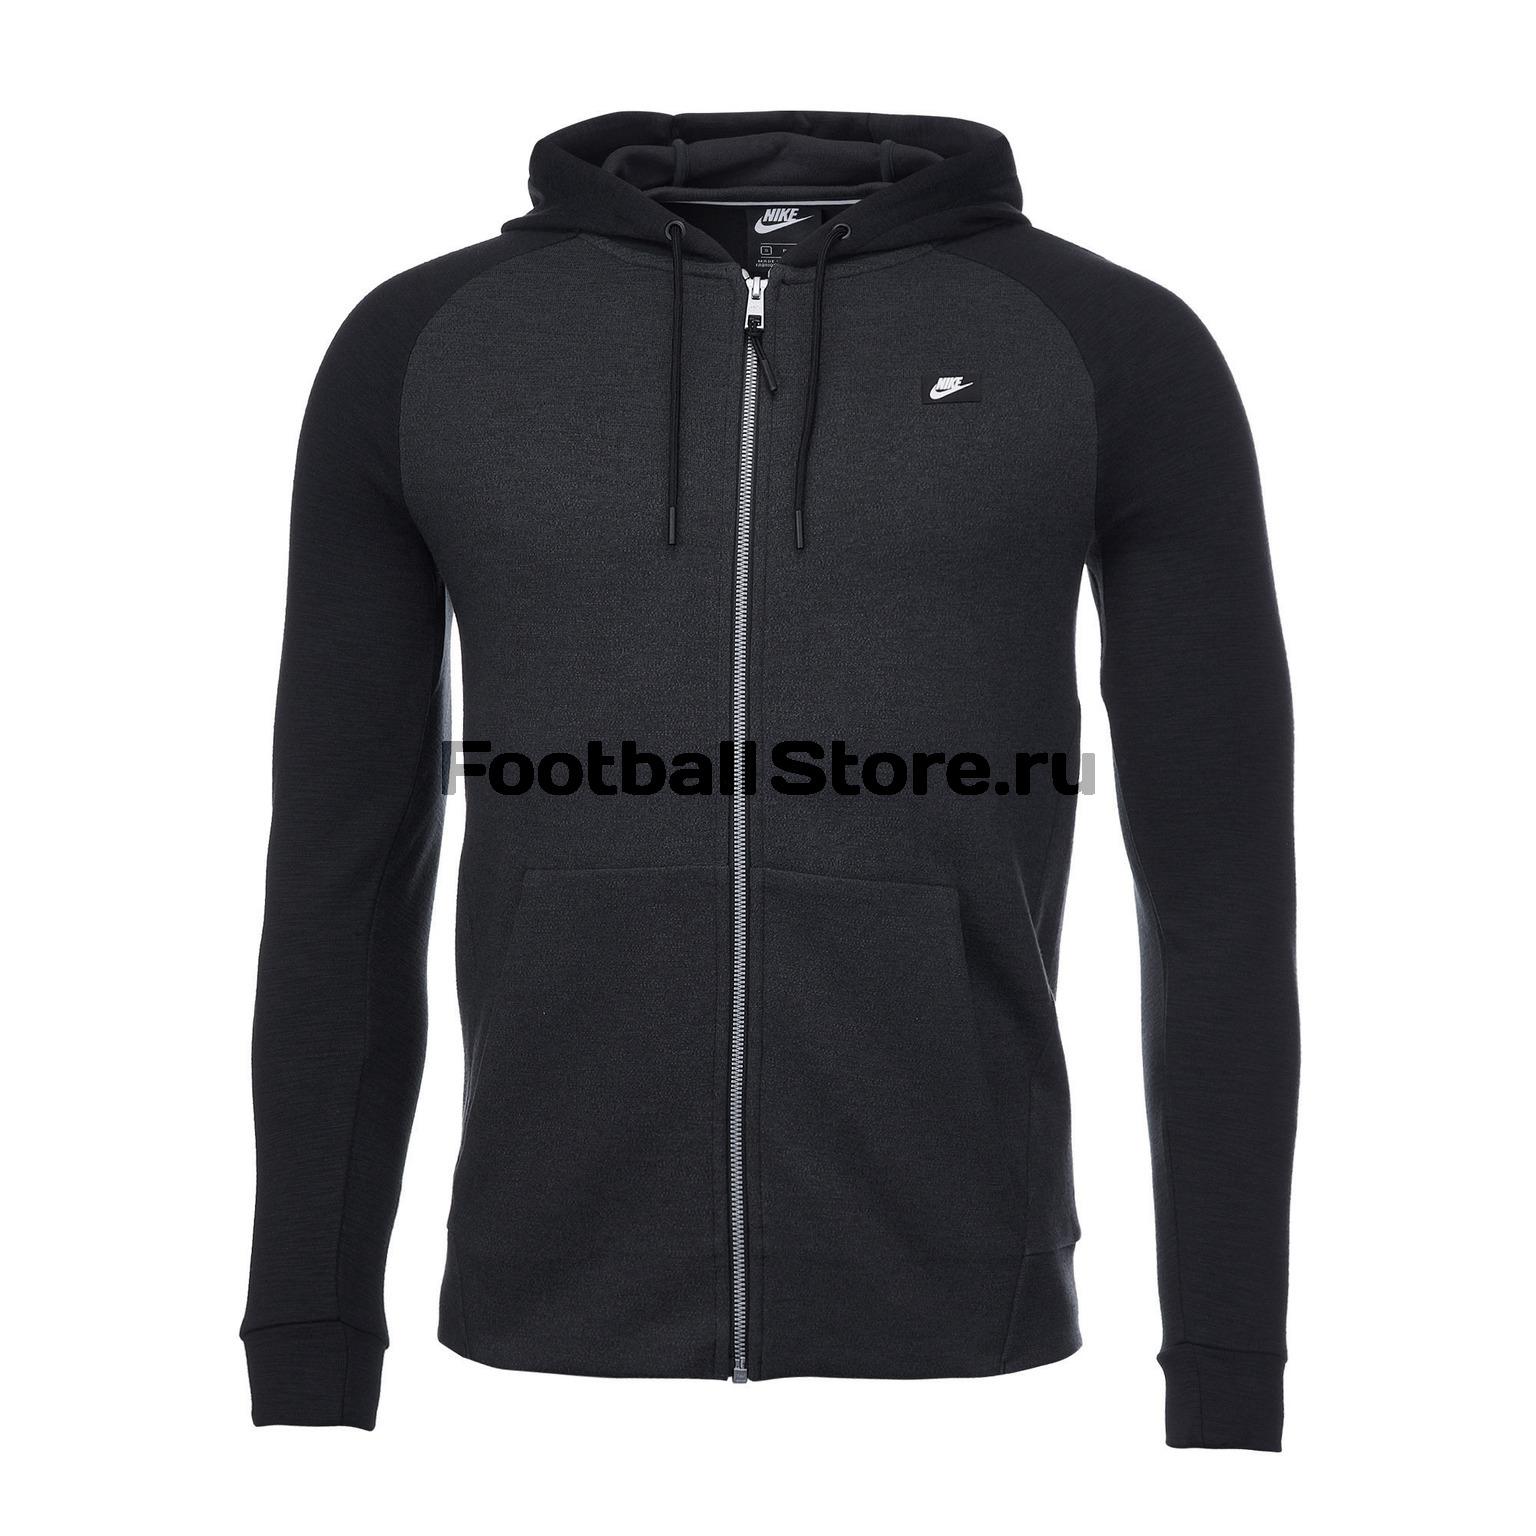 a2b82560 Толстовка Nike Optic Hoodie 928475-010 – купить в интернет магазине  footballstore, цена, фото